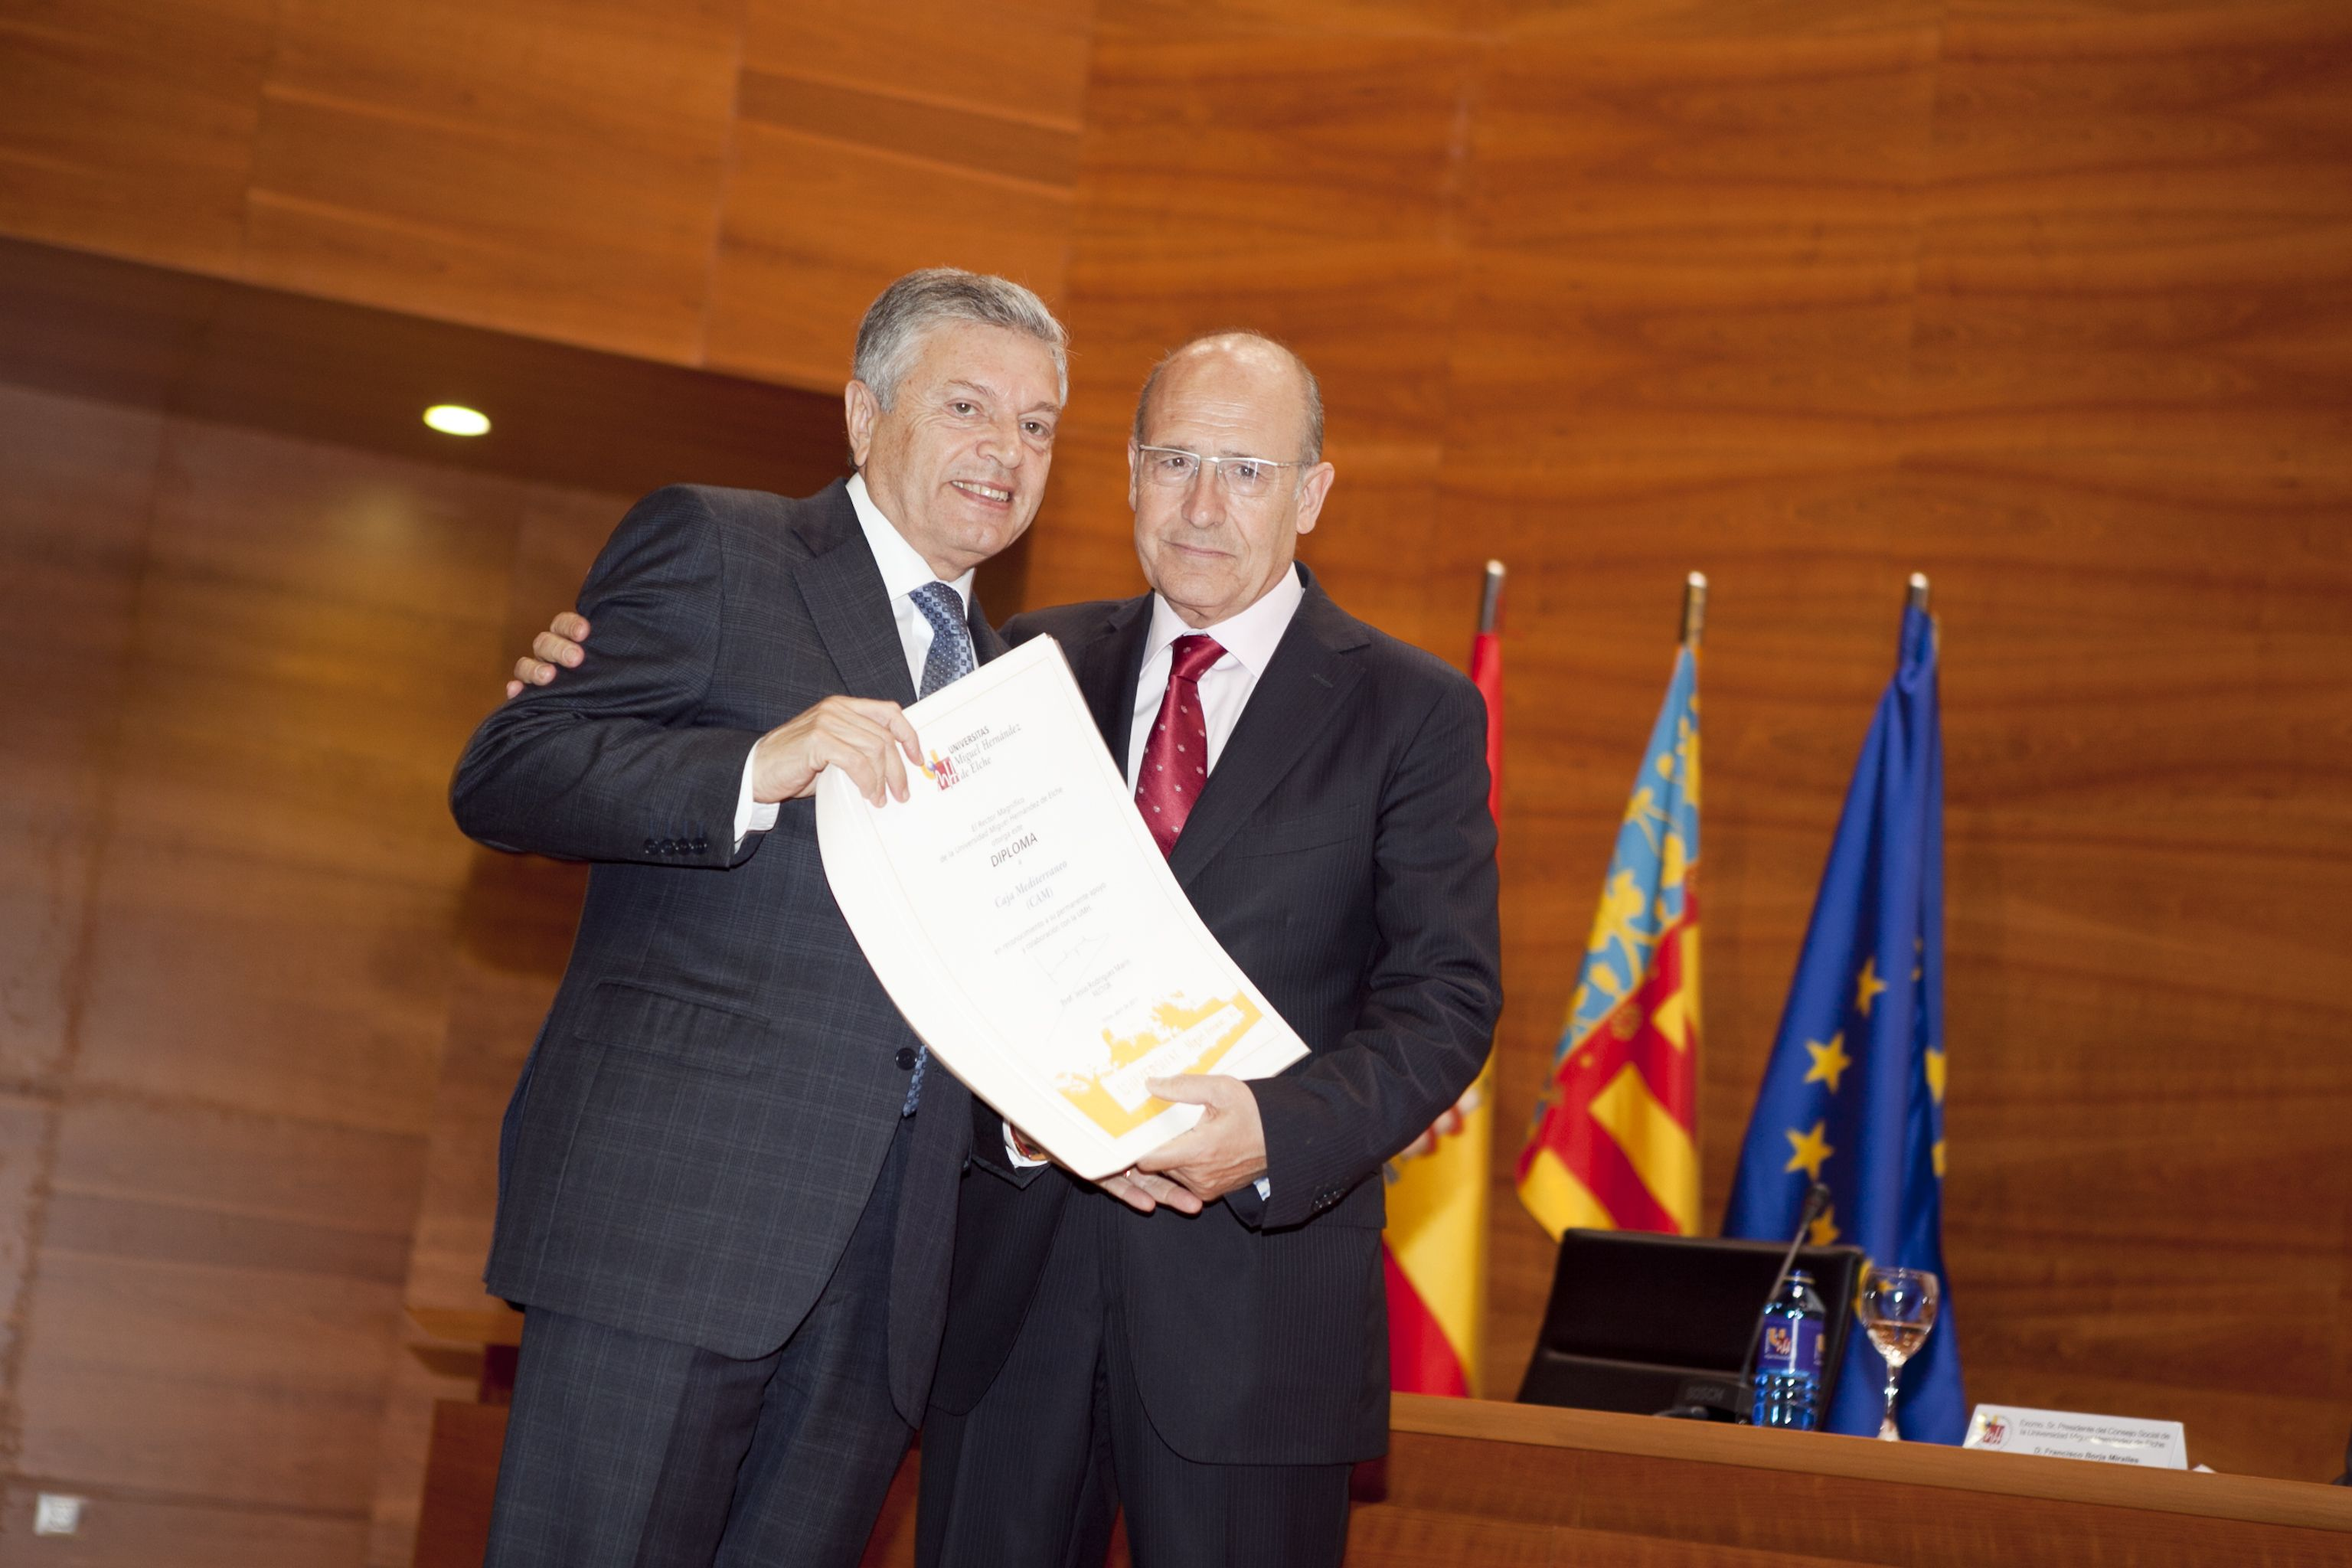 umh-diplomas-rector_mg_6949.jpg